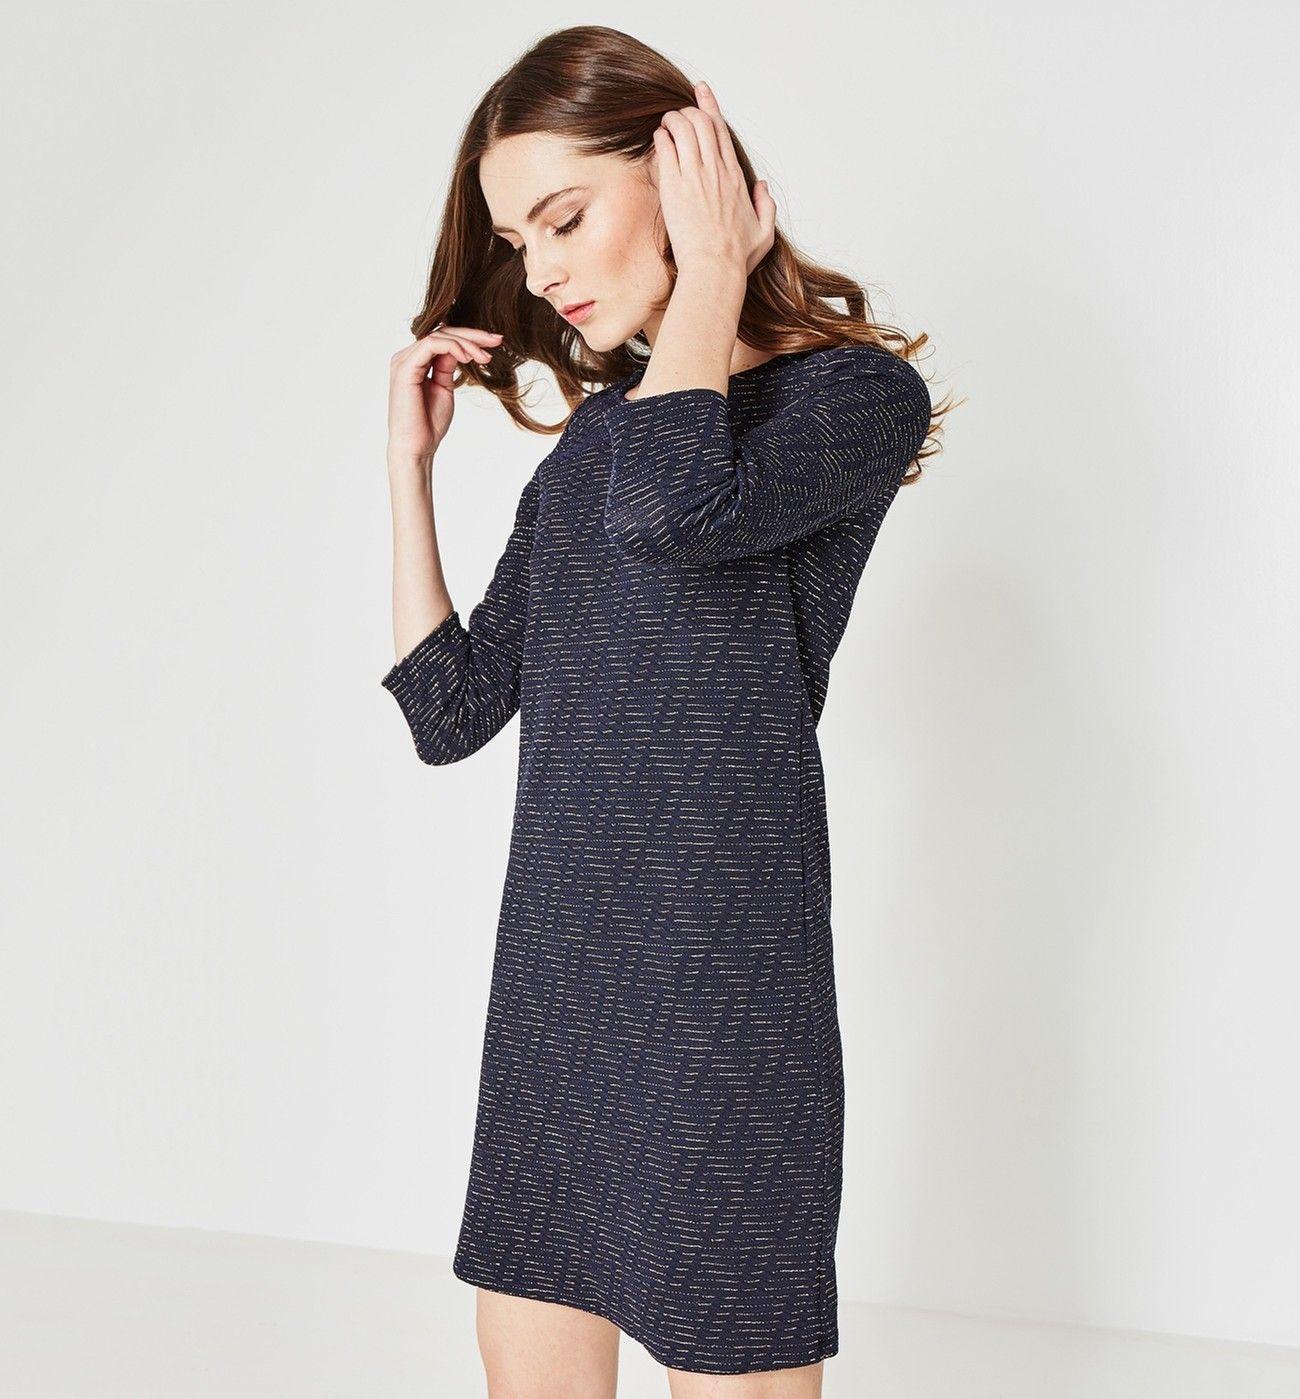 70f1b3513271e Robe effet jacquard Femme - Imprimé marine - Robes - Femme - Promod ...